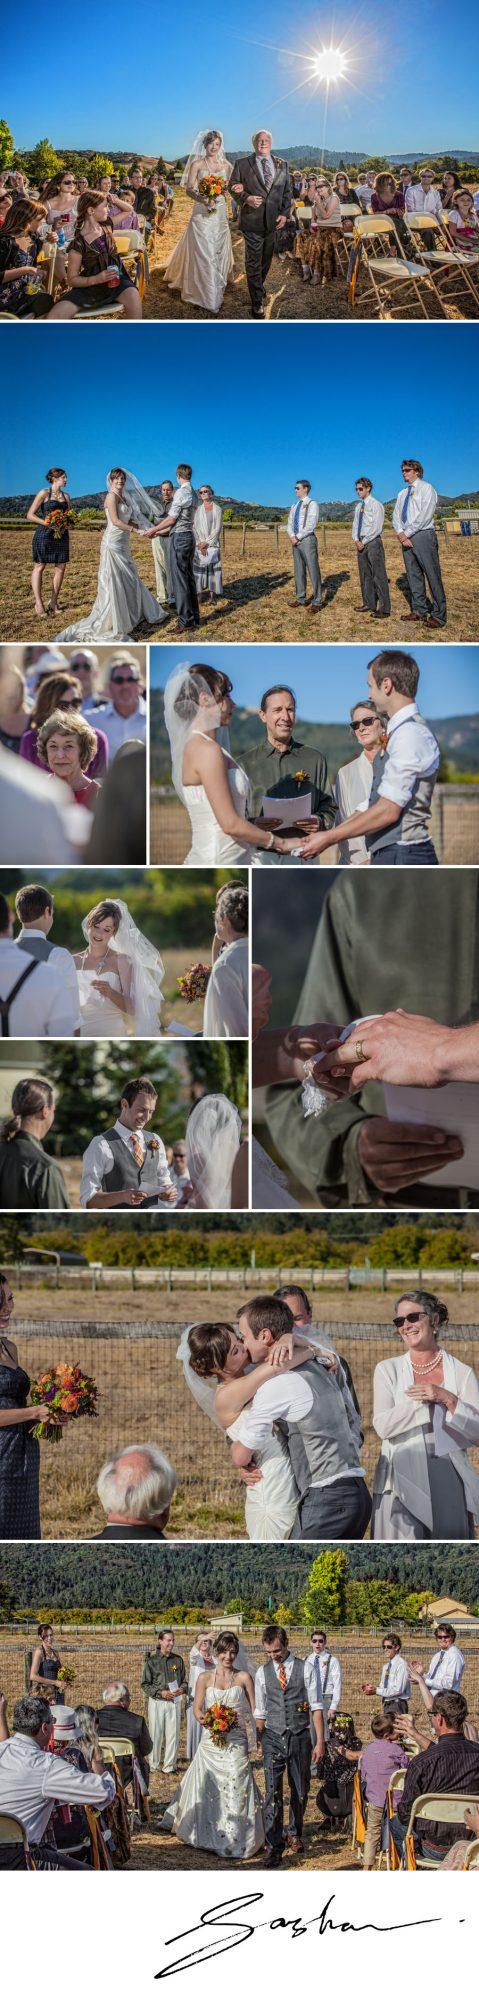 kenwood depot sonoma wedding